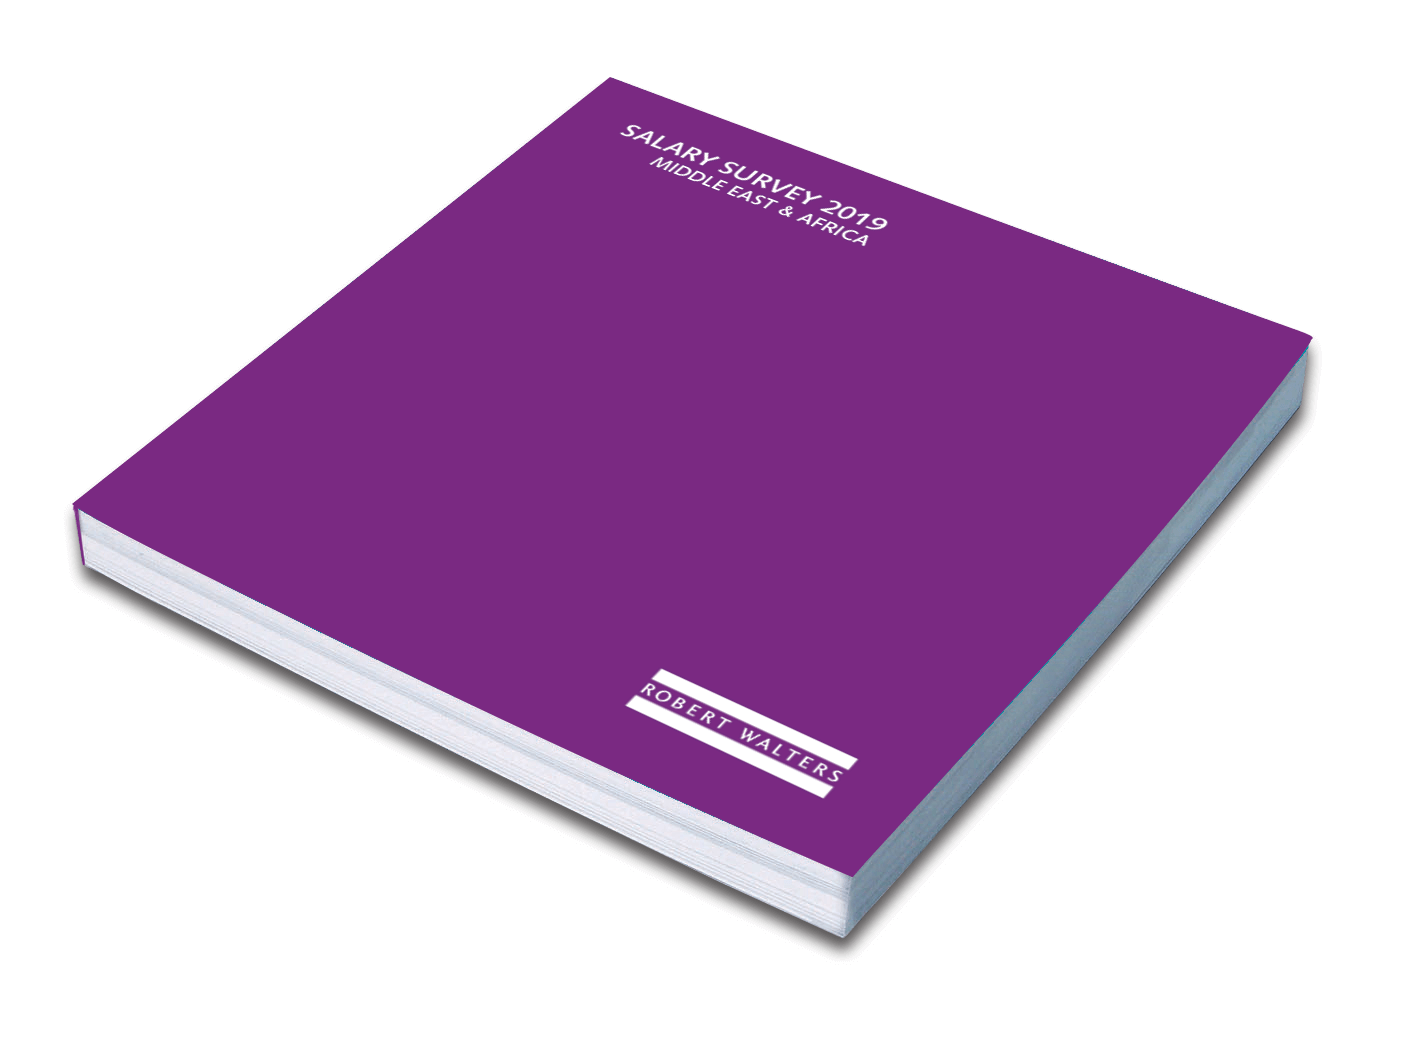 Robert Walters Salary Survey 2019